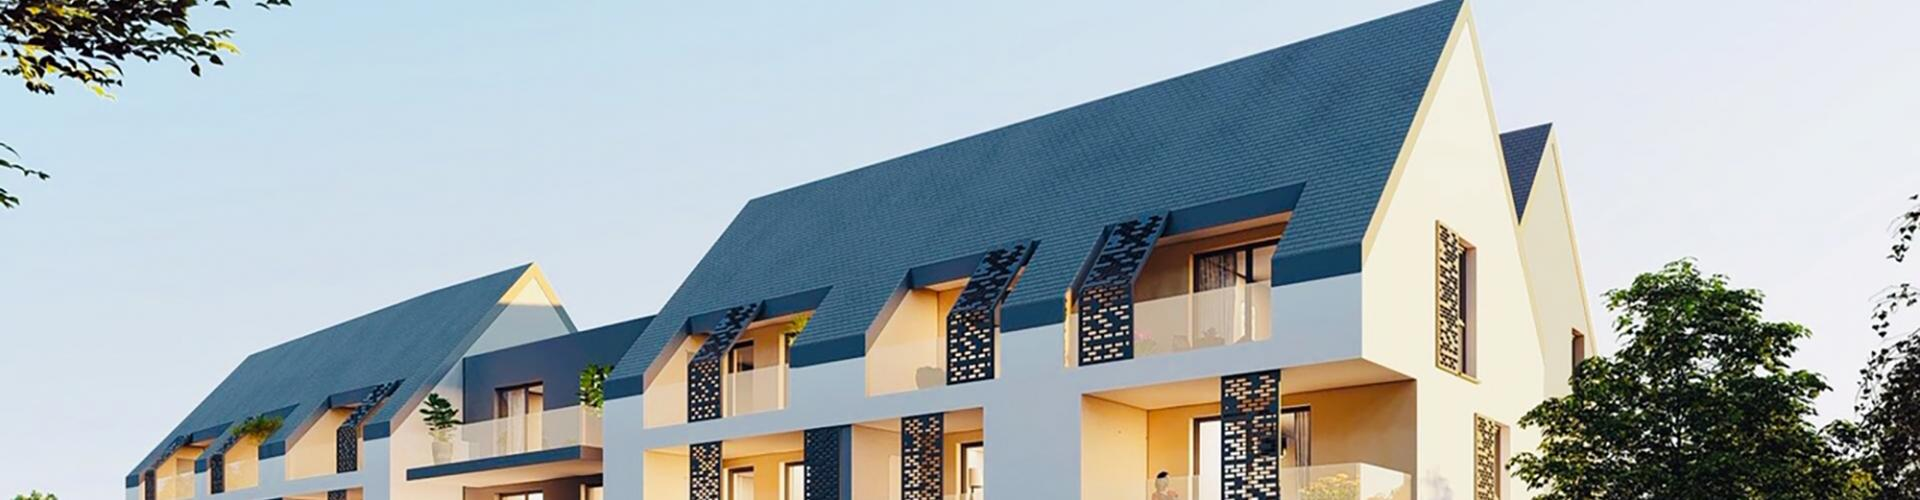 Programme immobilier neuf Le Lichtenberg - Oberhoffen-sur-Moder